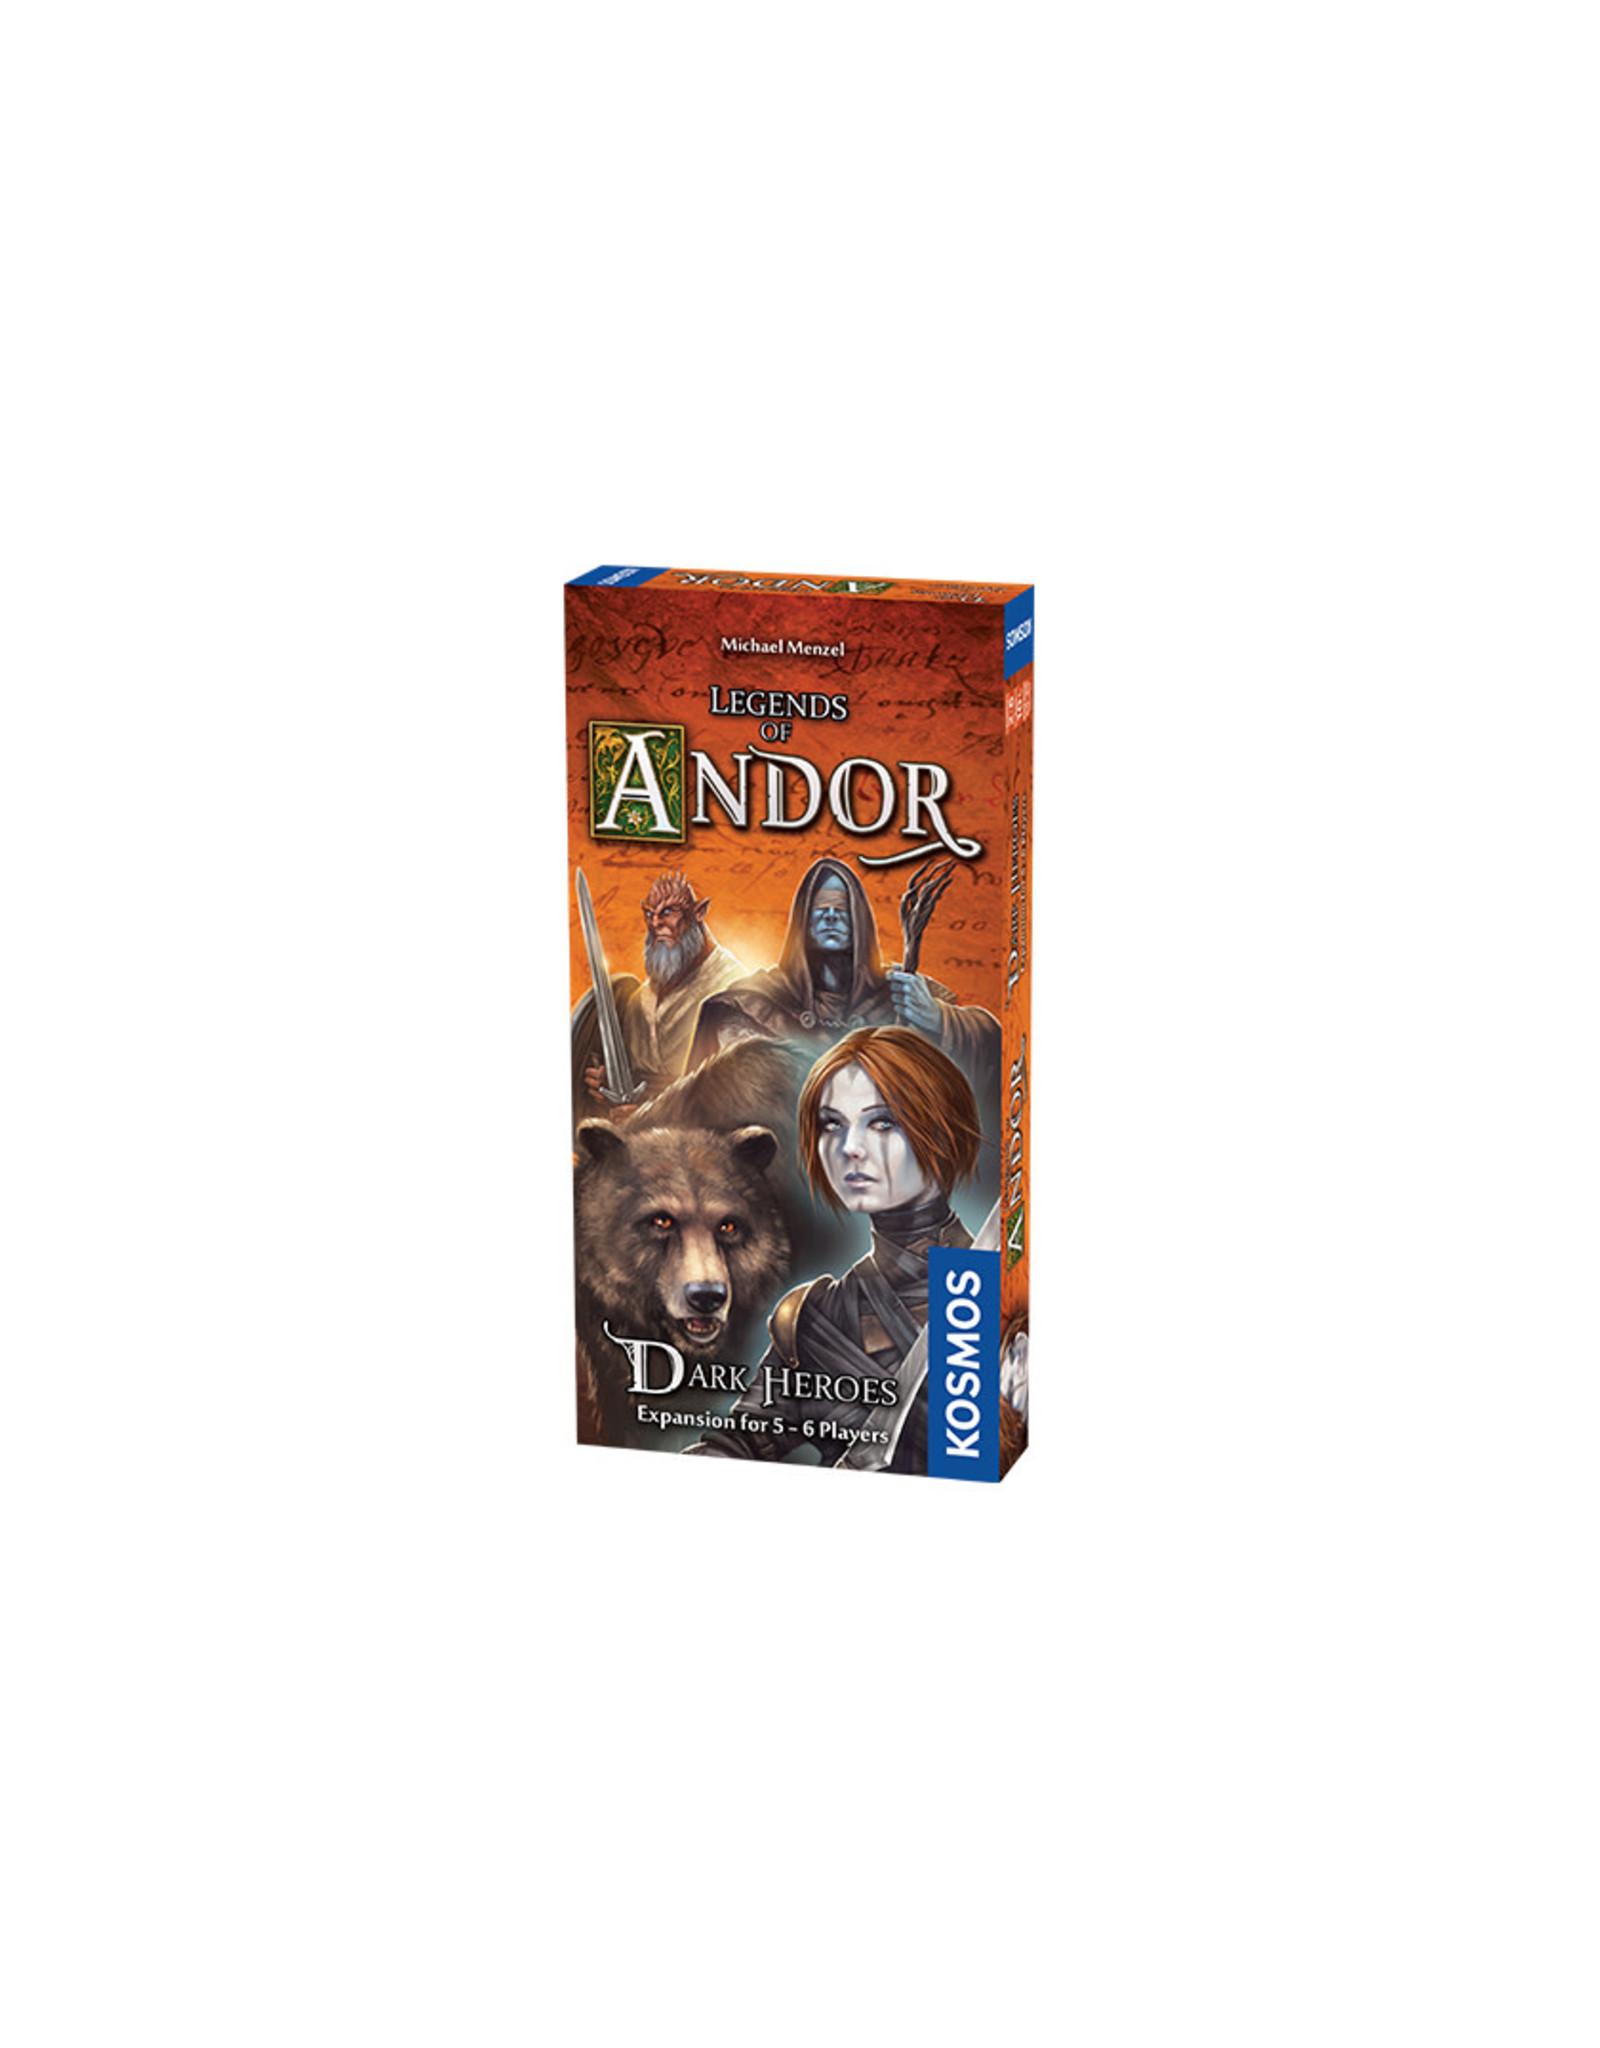 Thames & Kosmos Legends of Andor: Dark Heroes Expansion